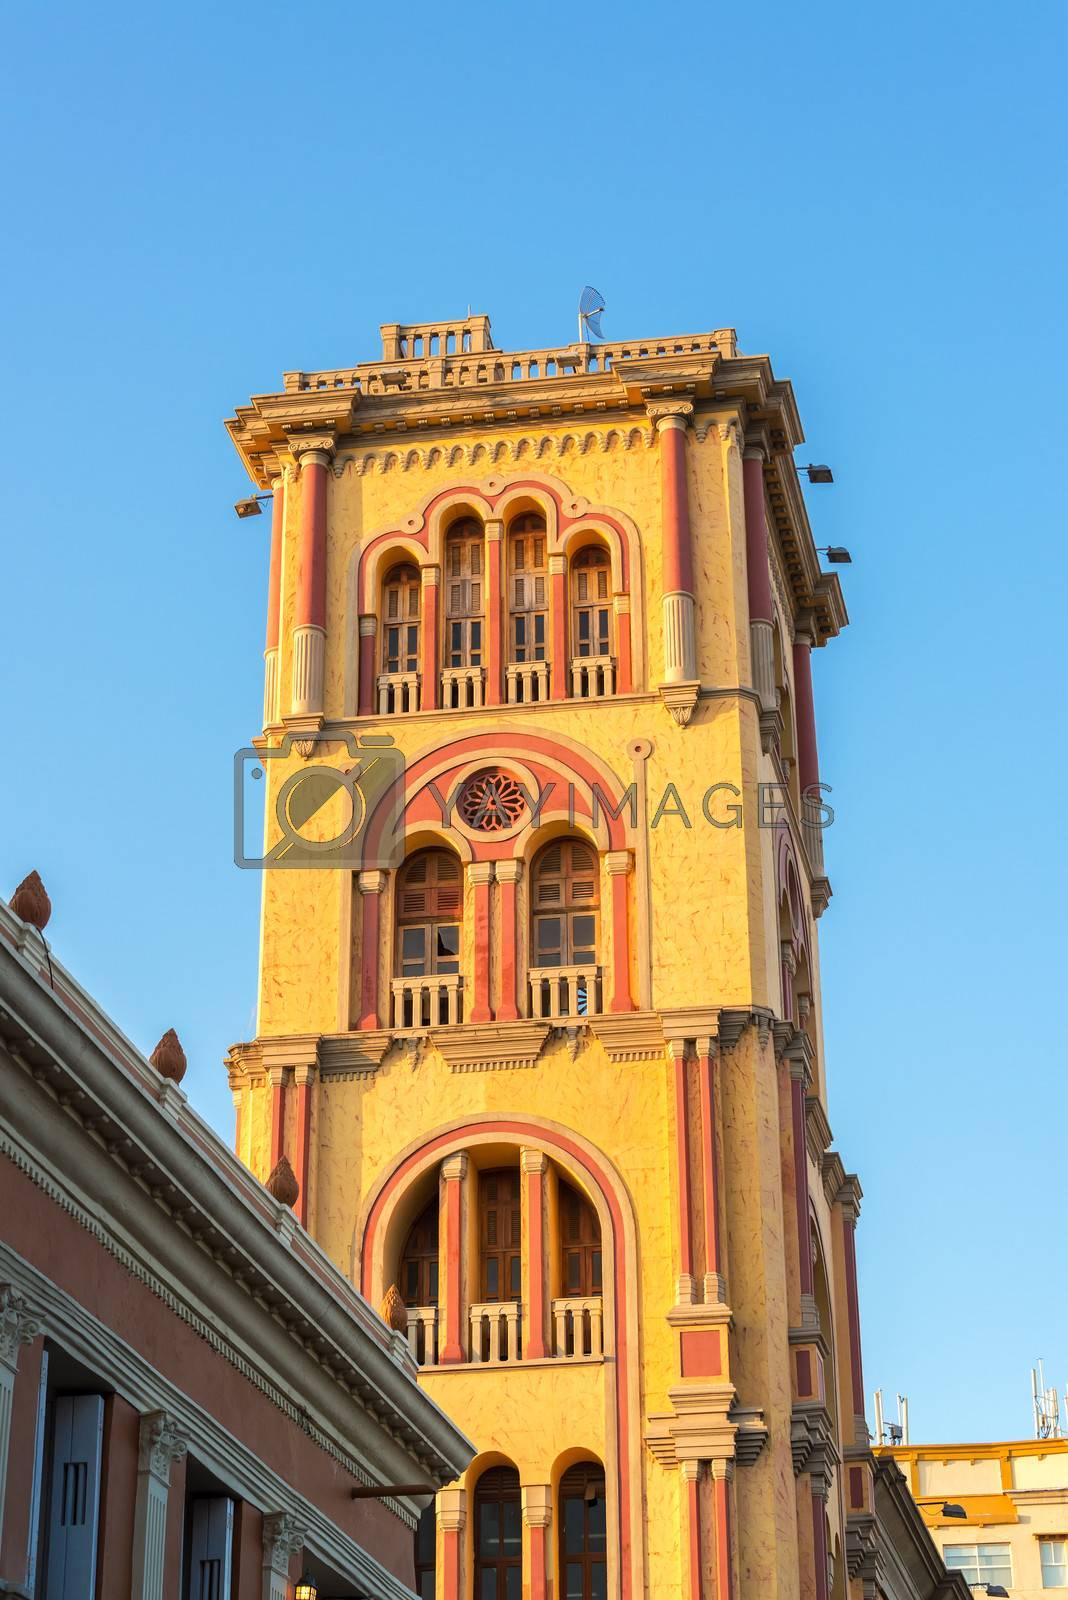 Royalty free image of Cartagena Public University Tower by jkraft5